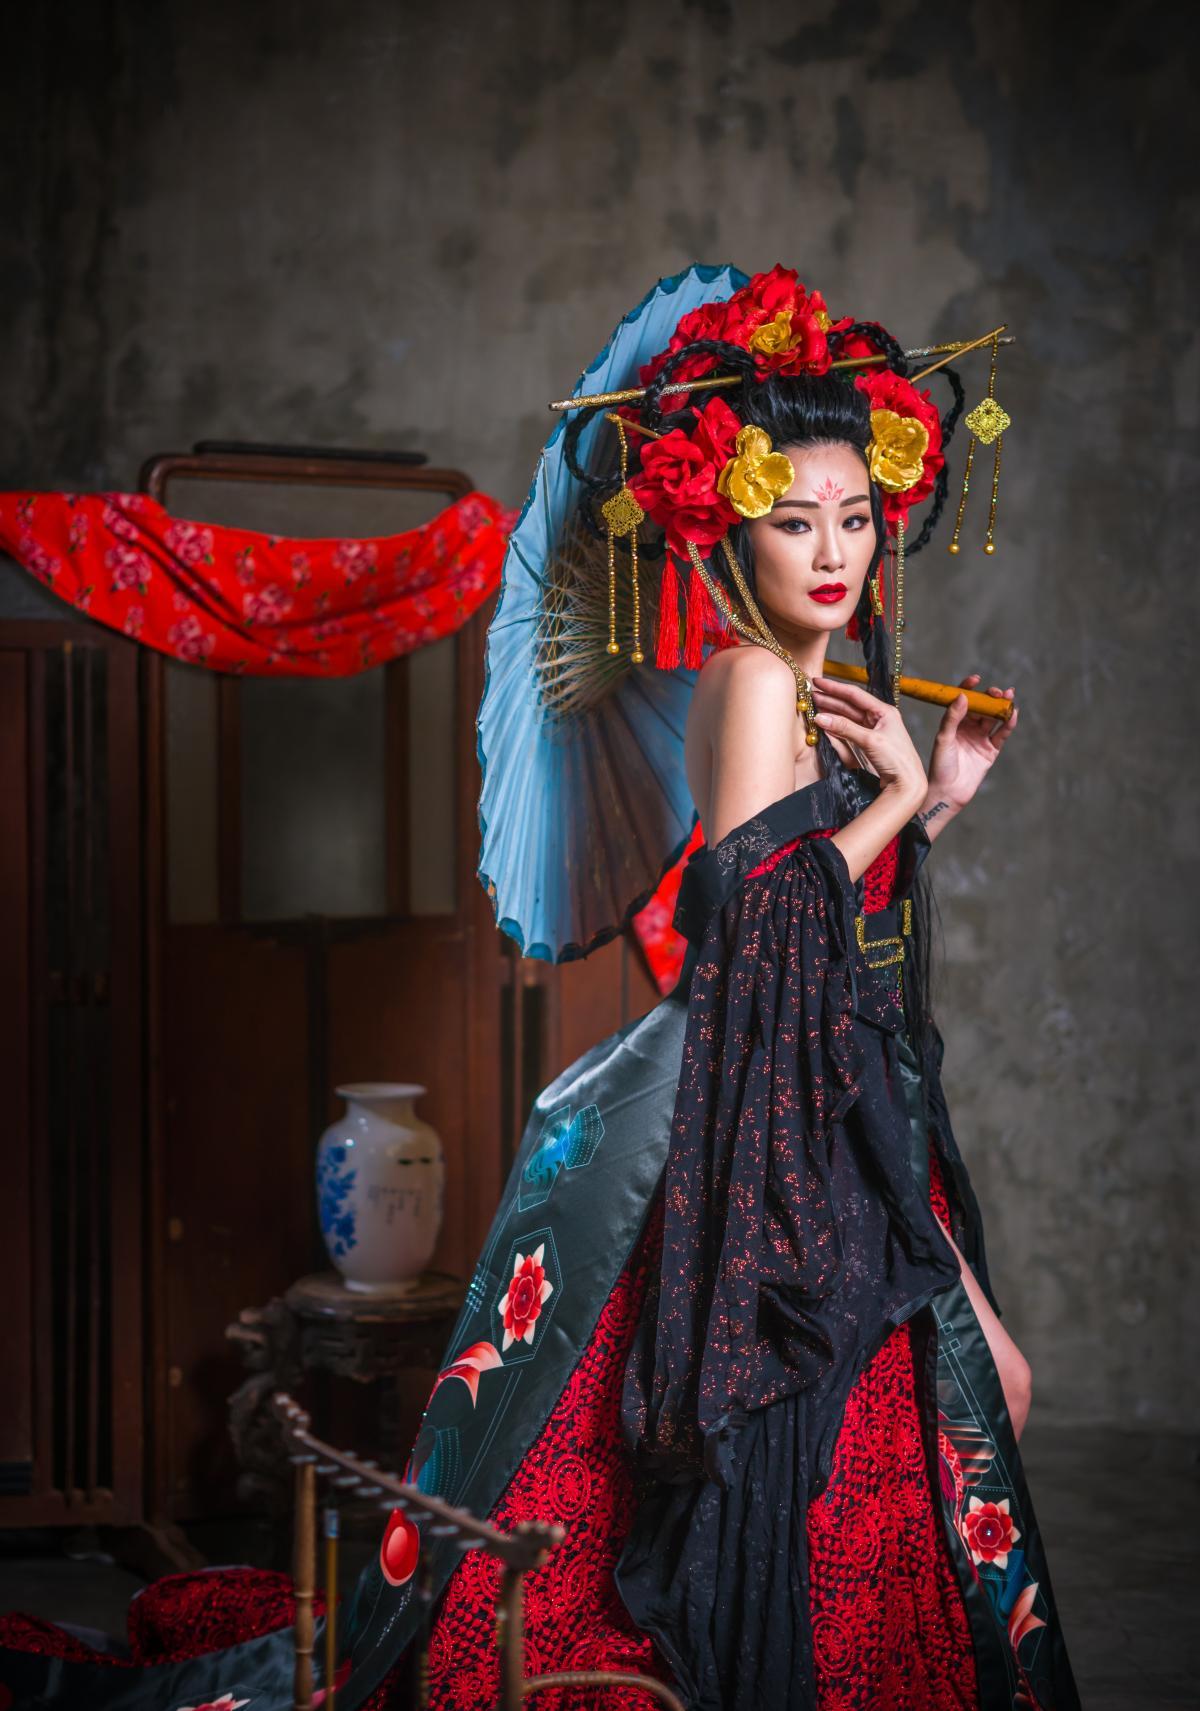 Costume Dancer Performer